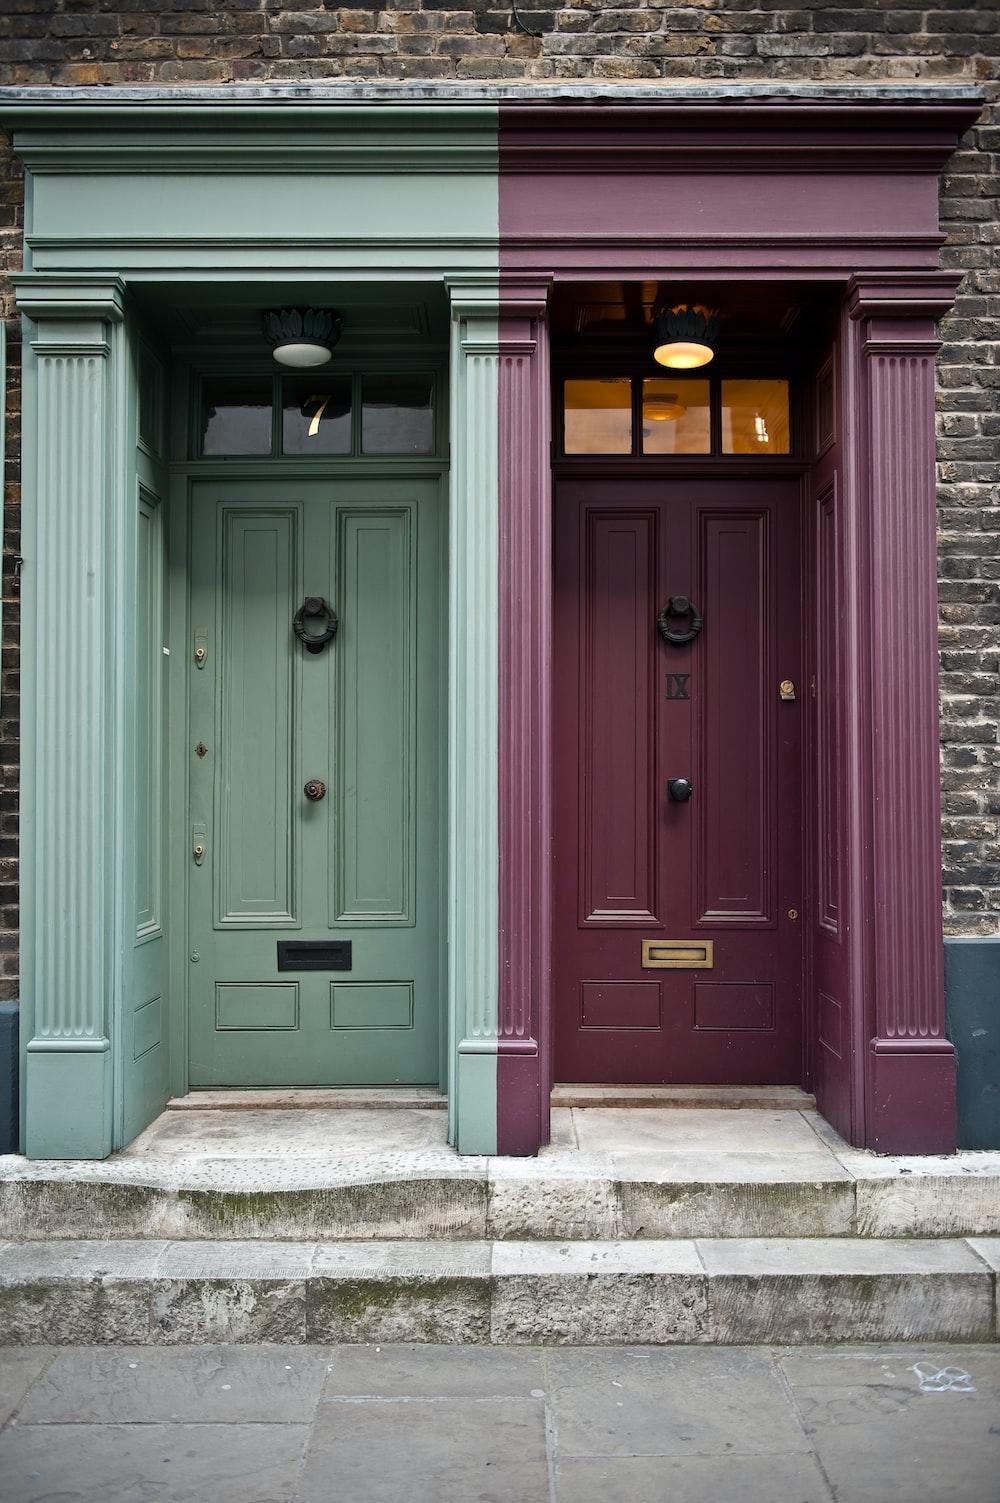 photo of two maroon and green door panels